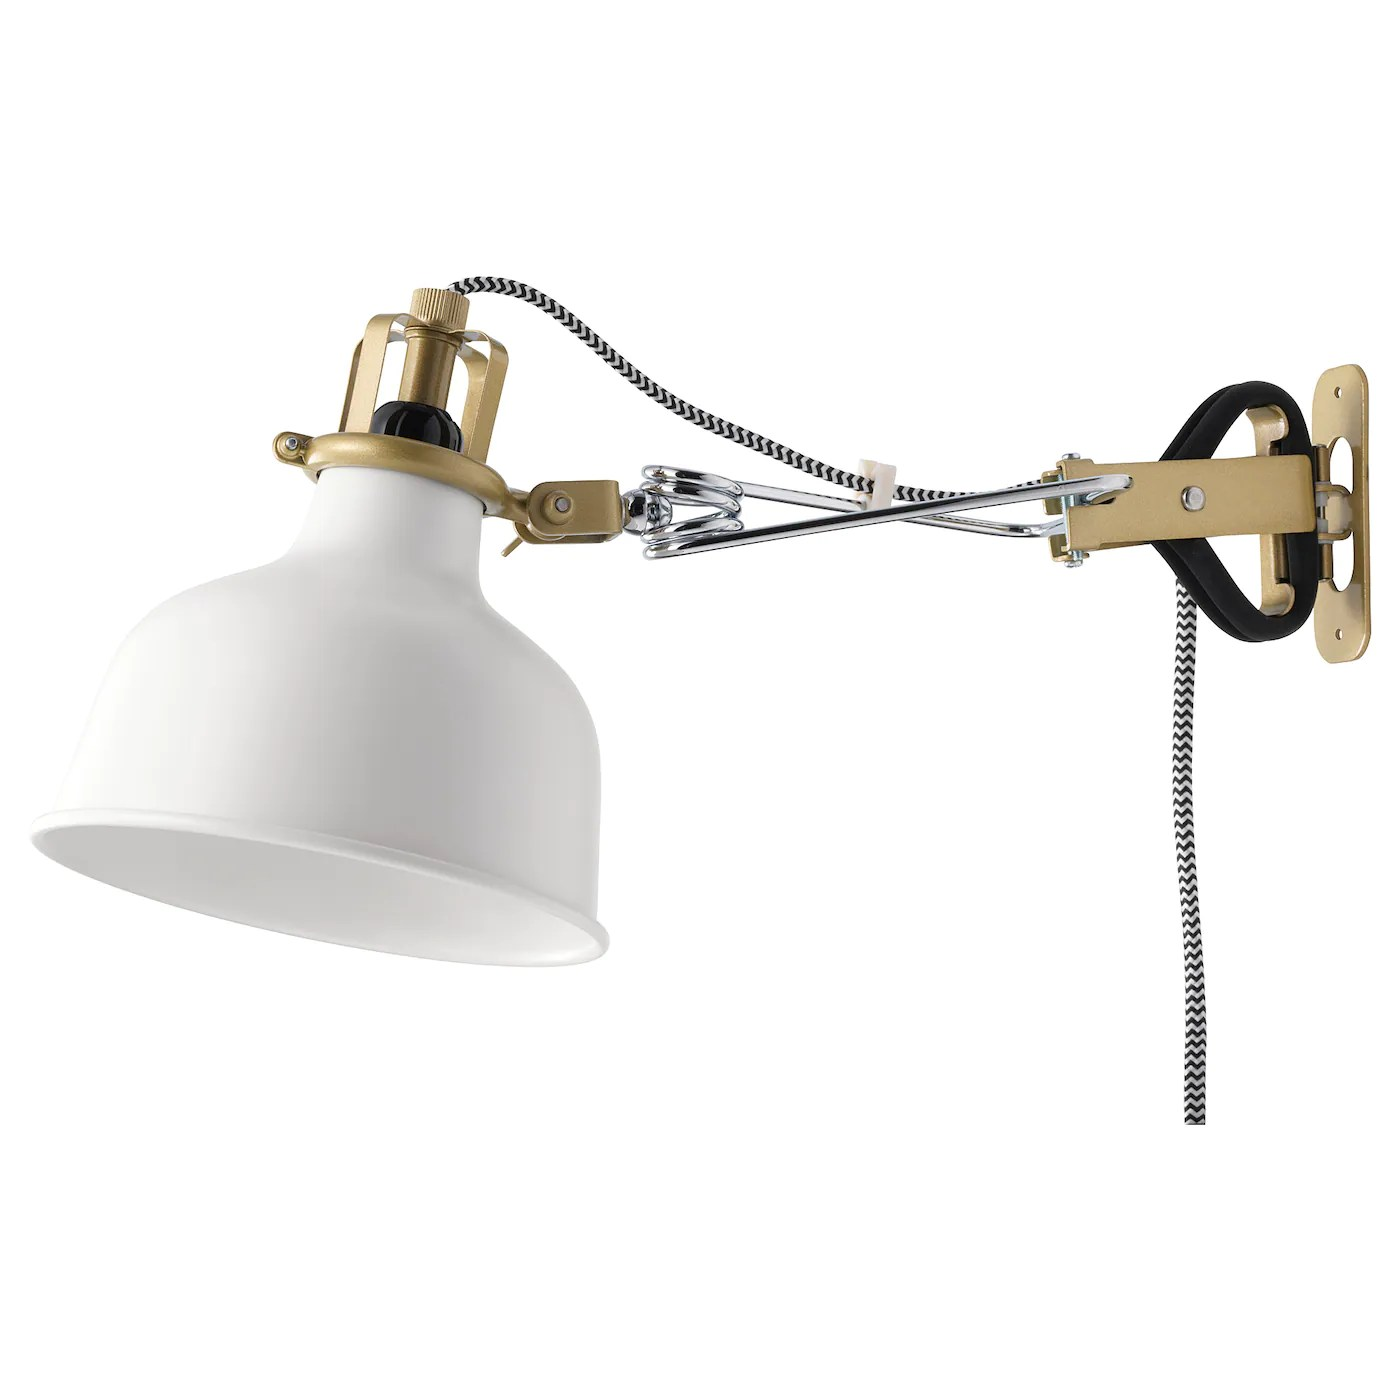 Ranarp Vaeg Klemspot Rahvid Ikea